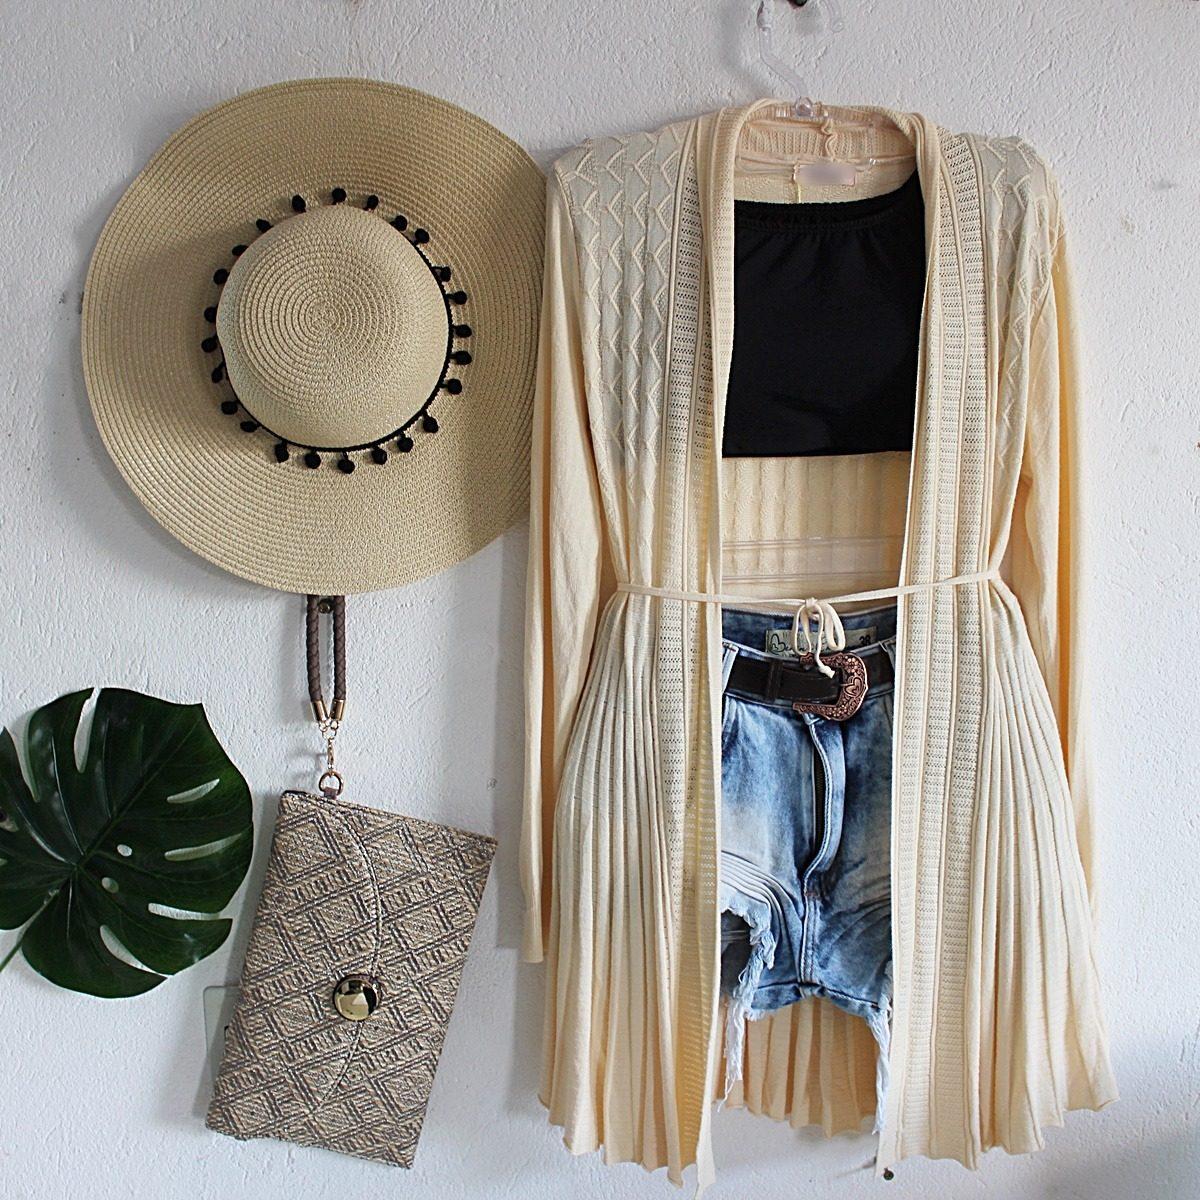 a621bc8bc roupas femininas blusas kimono casaco suéter importado 2553. Carregando  zoom.